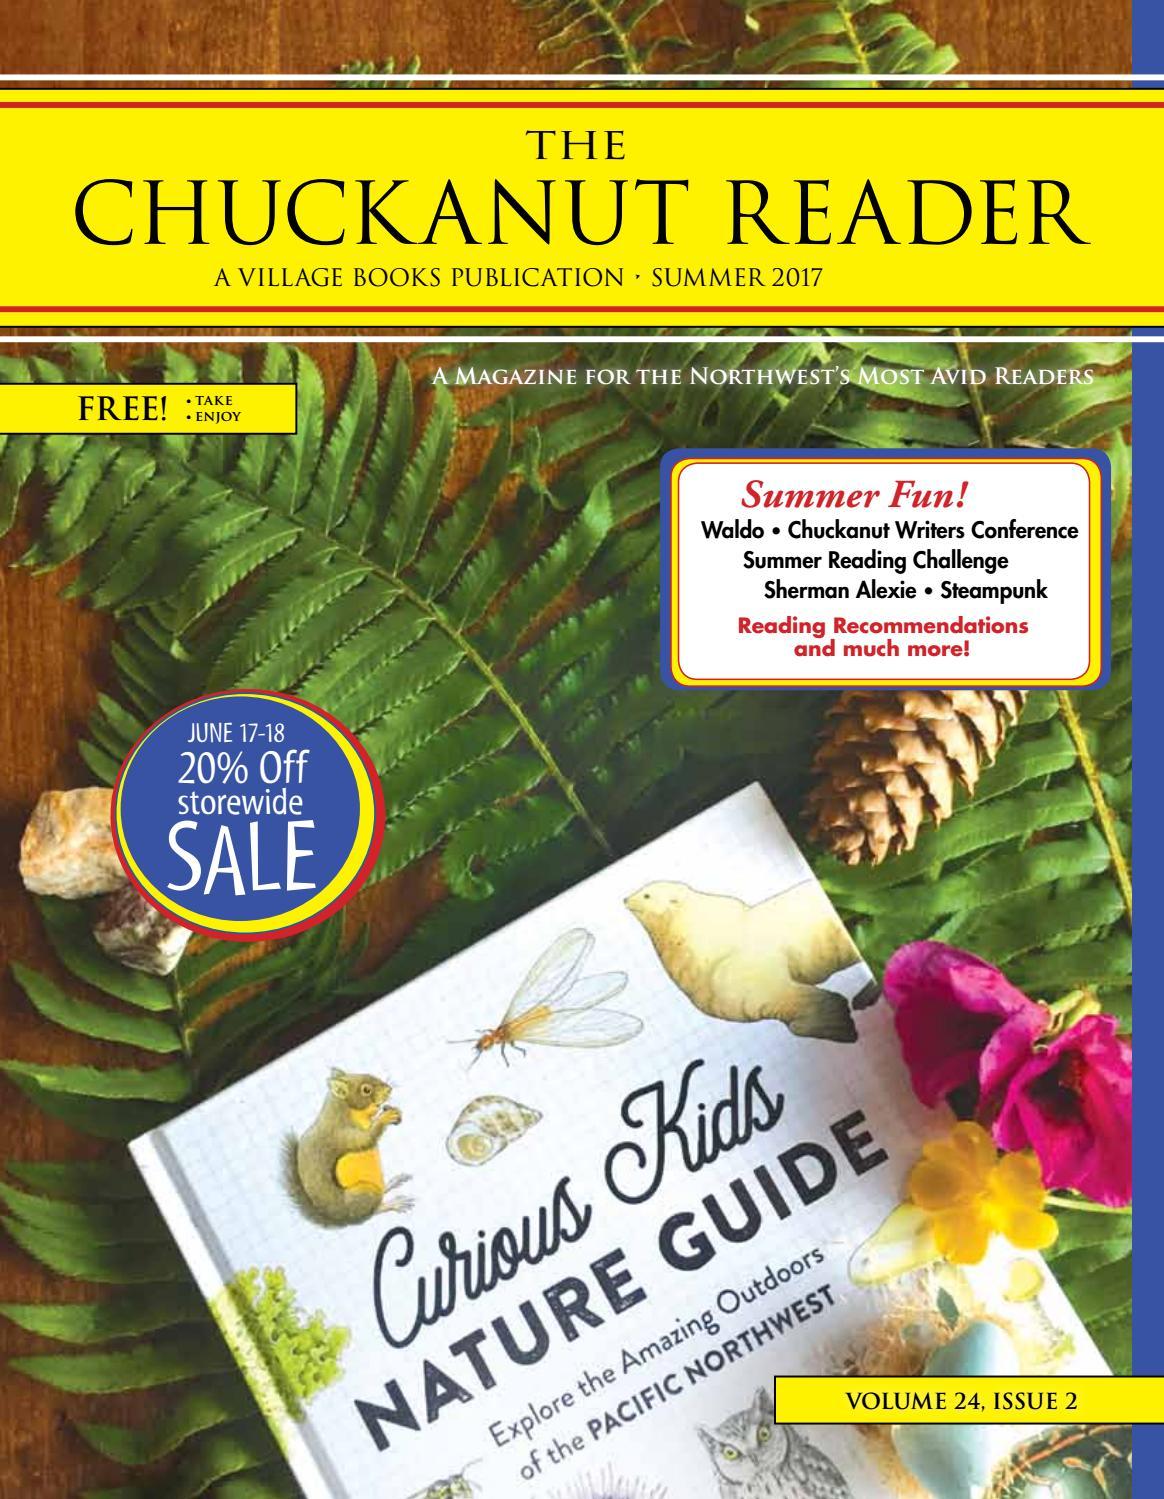 Chuckanut Reader Summer 2017 By Village Books Paper Dreams Issuu Voucher Mcd Rp 100000